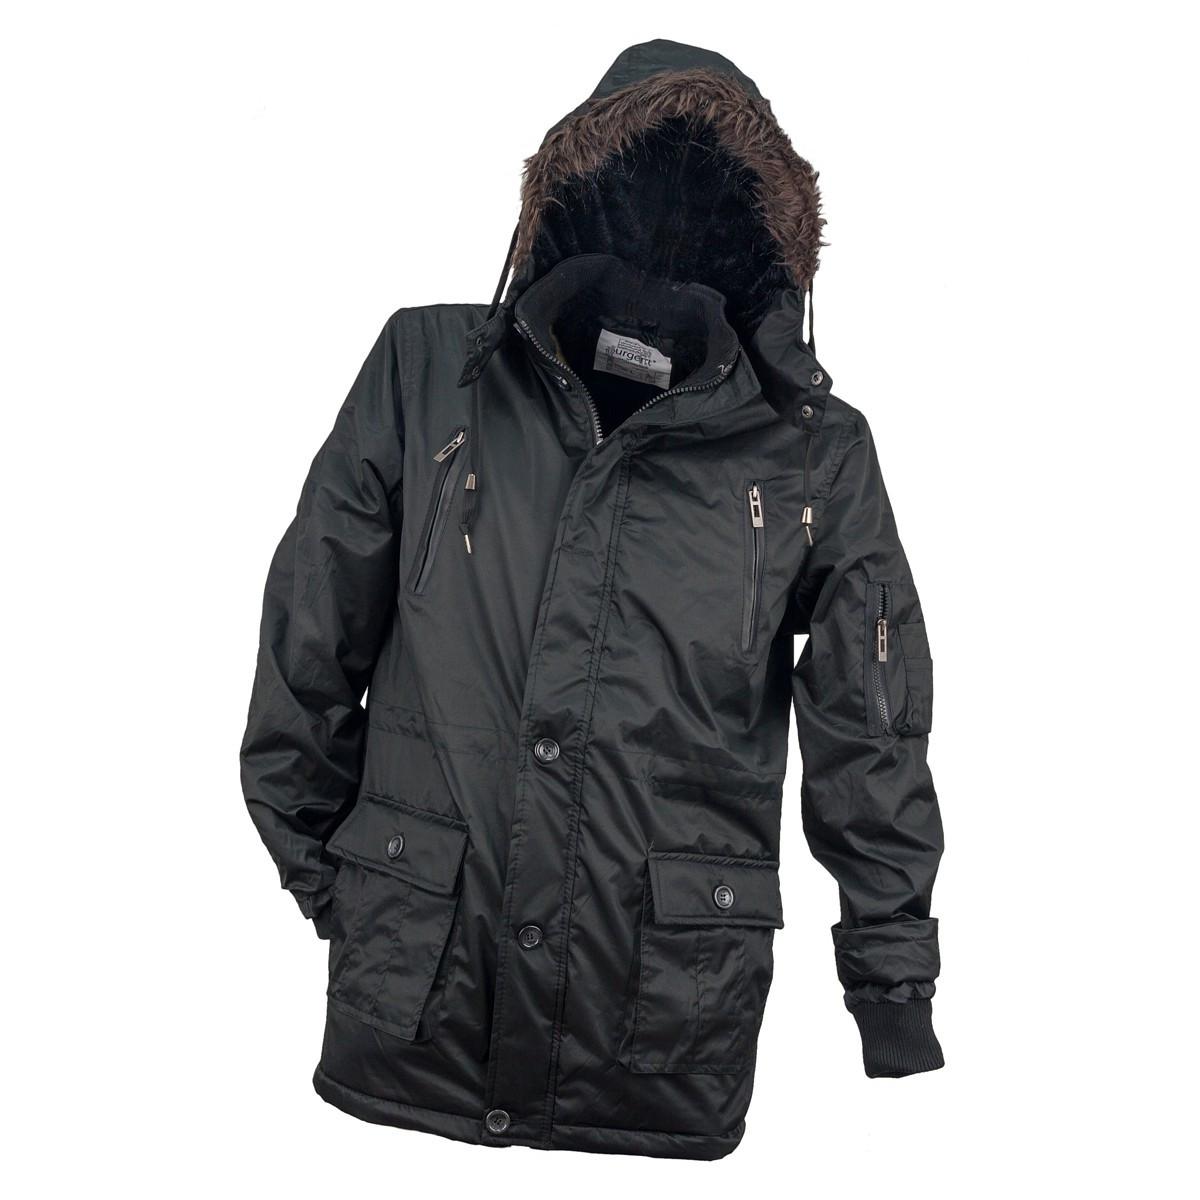 Куртка демисезонная KURTKA OCIEPLANA URG-1720 BLACK